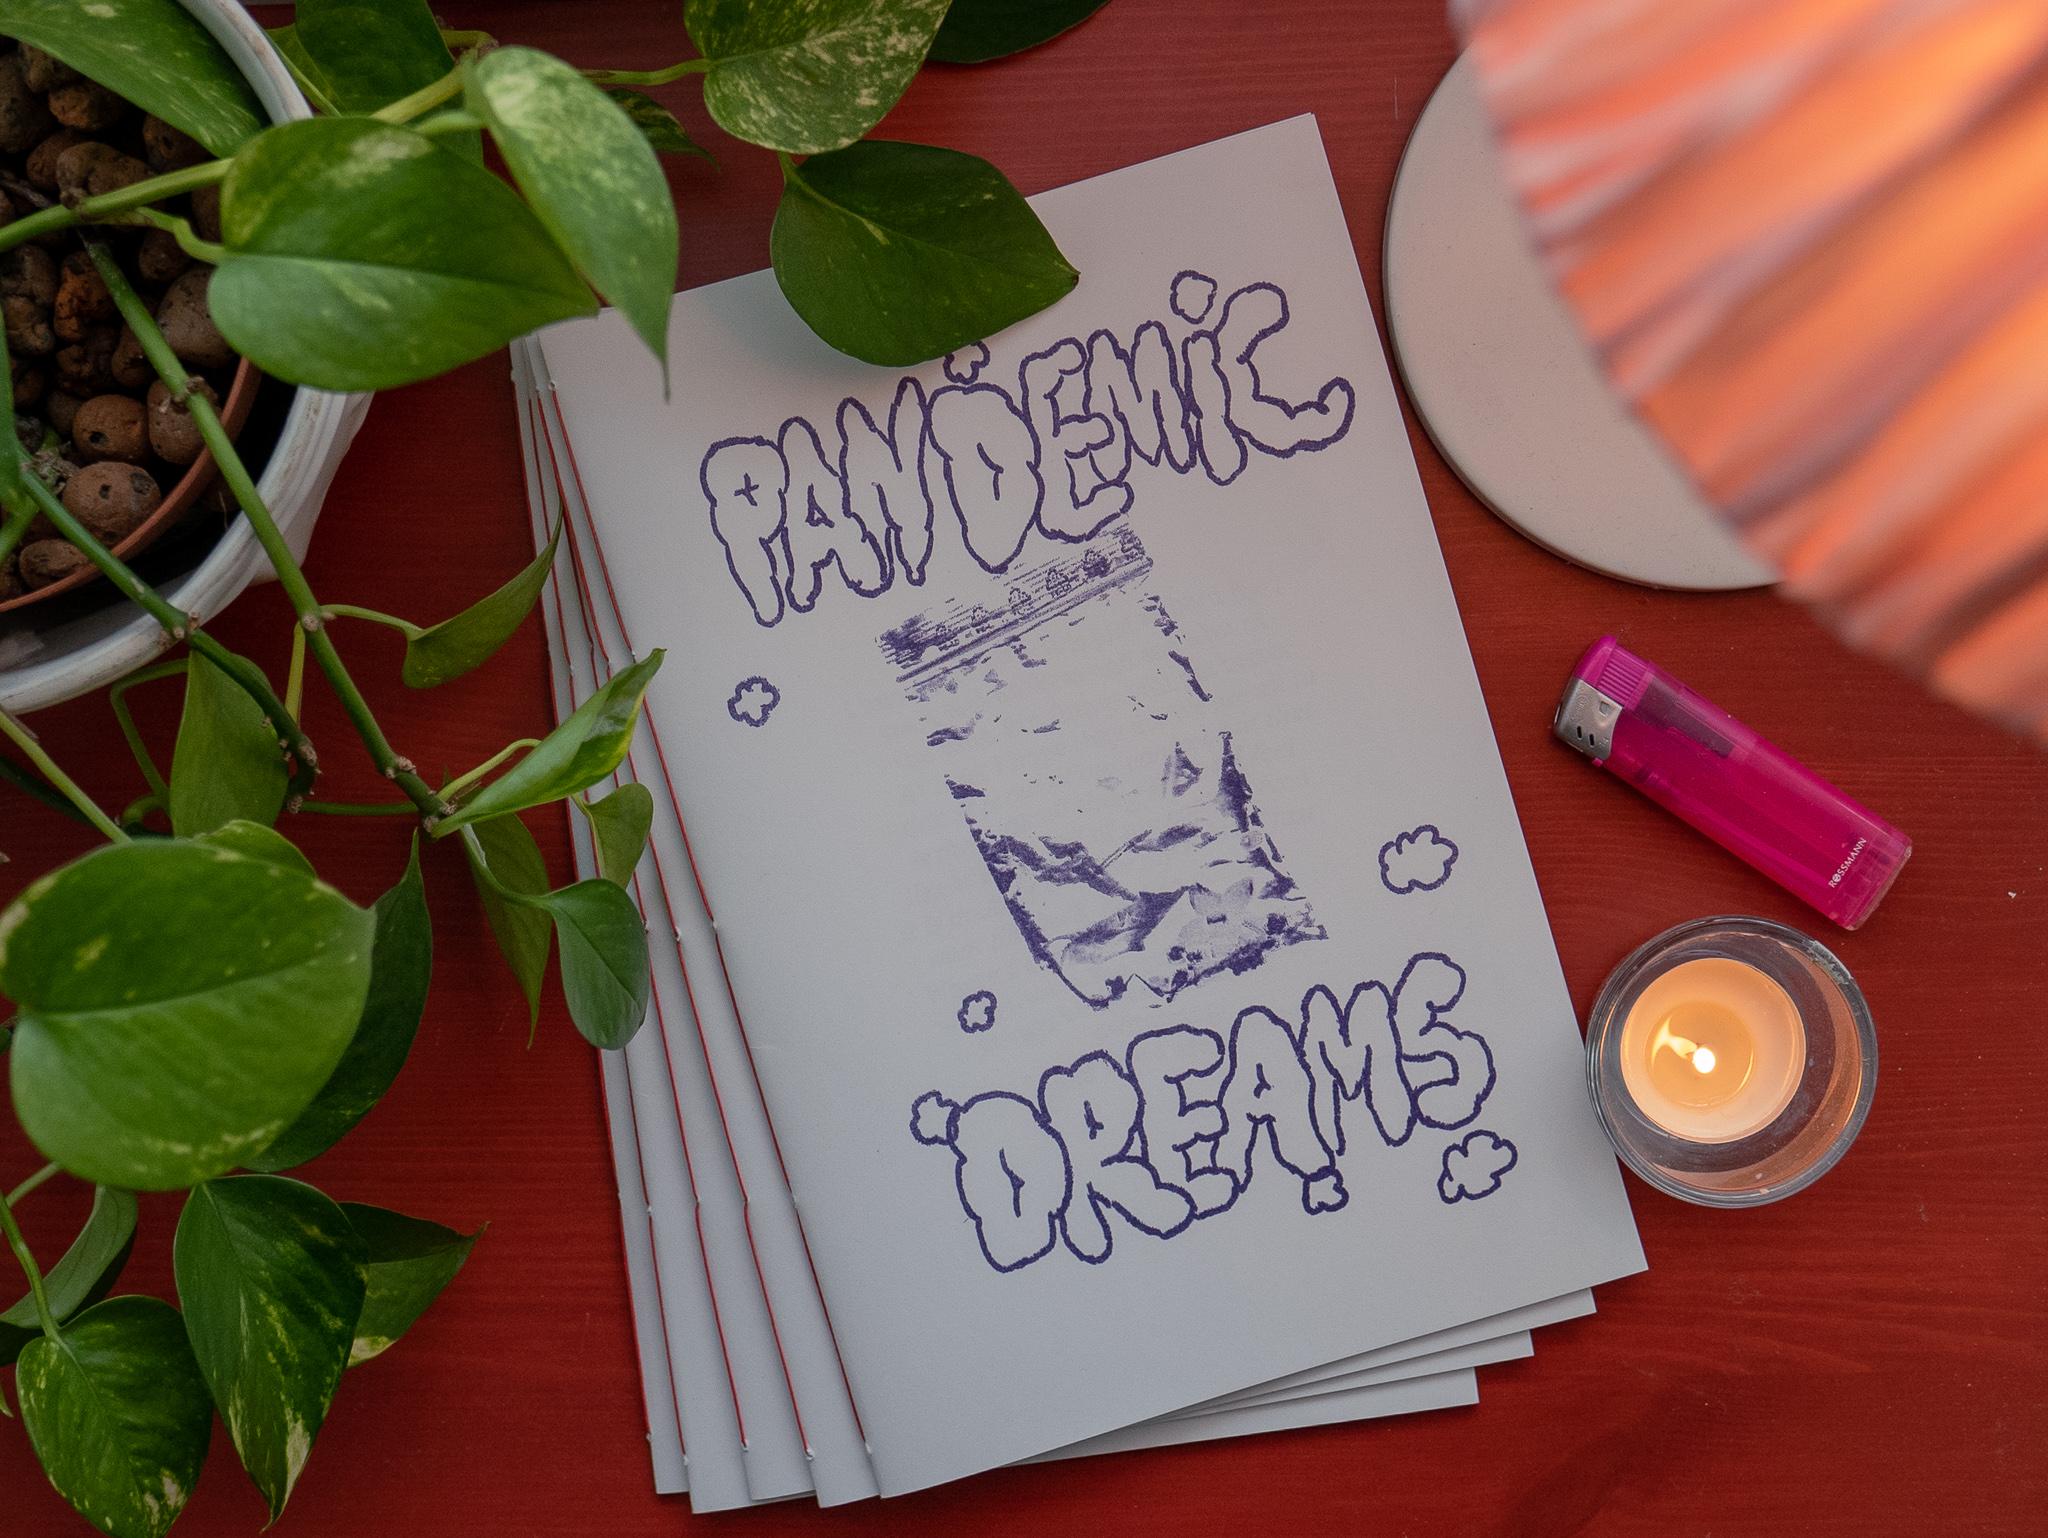 Pandemic Dreams Dokumentation